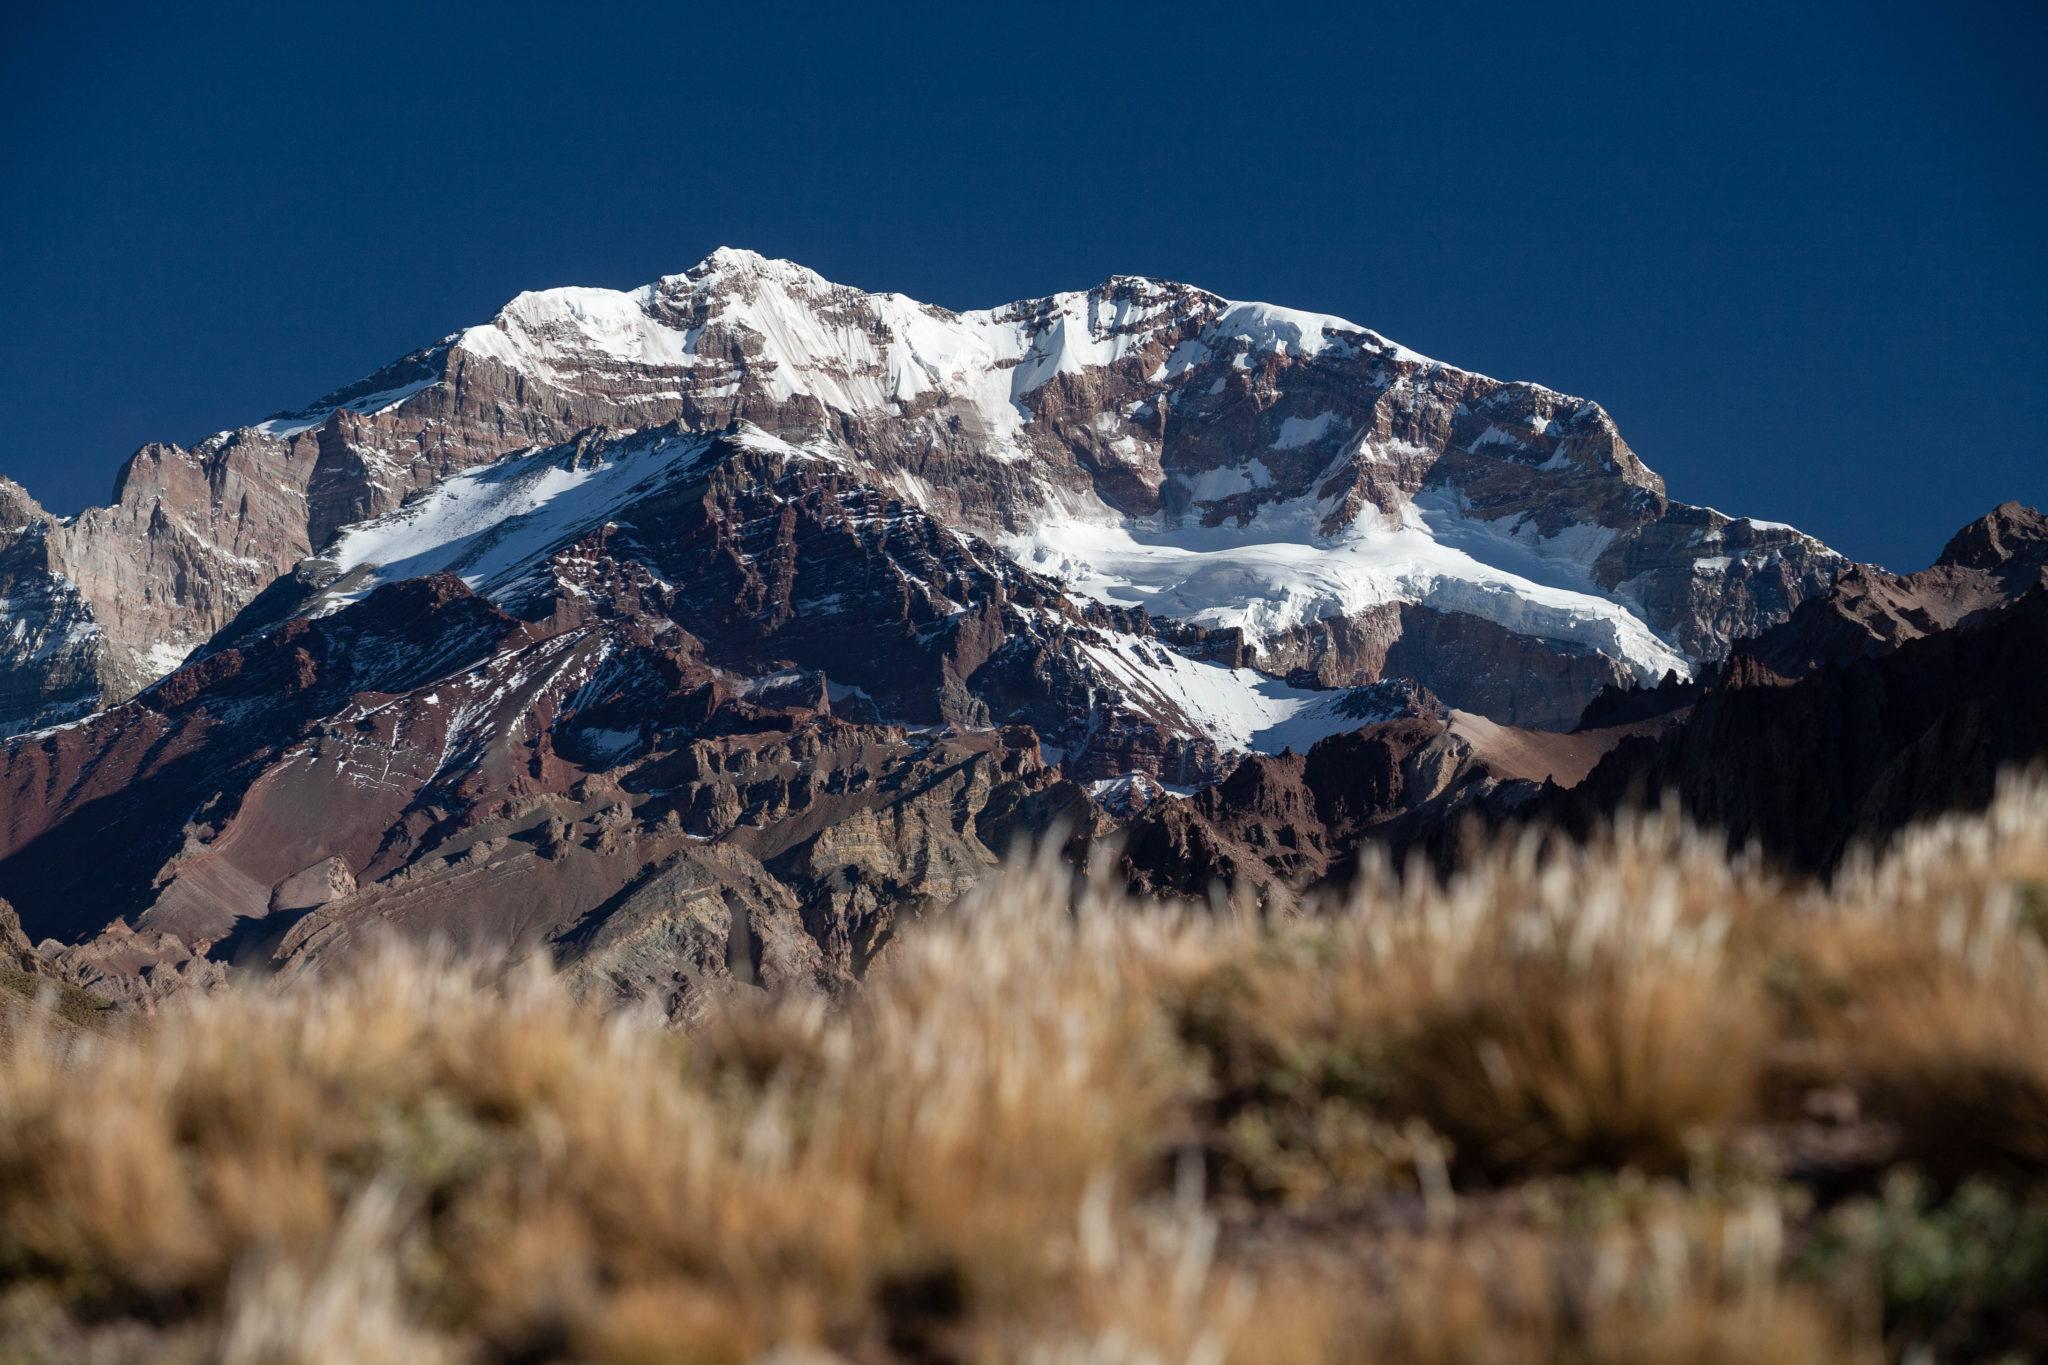 Speed Climb Aconcagua in 12 days: Argentina Mountaineering Trip